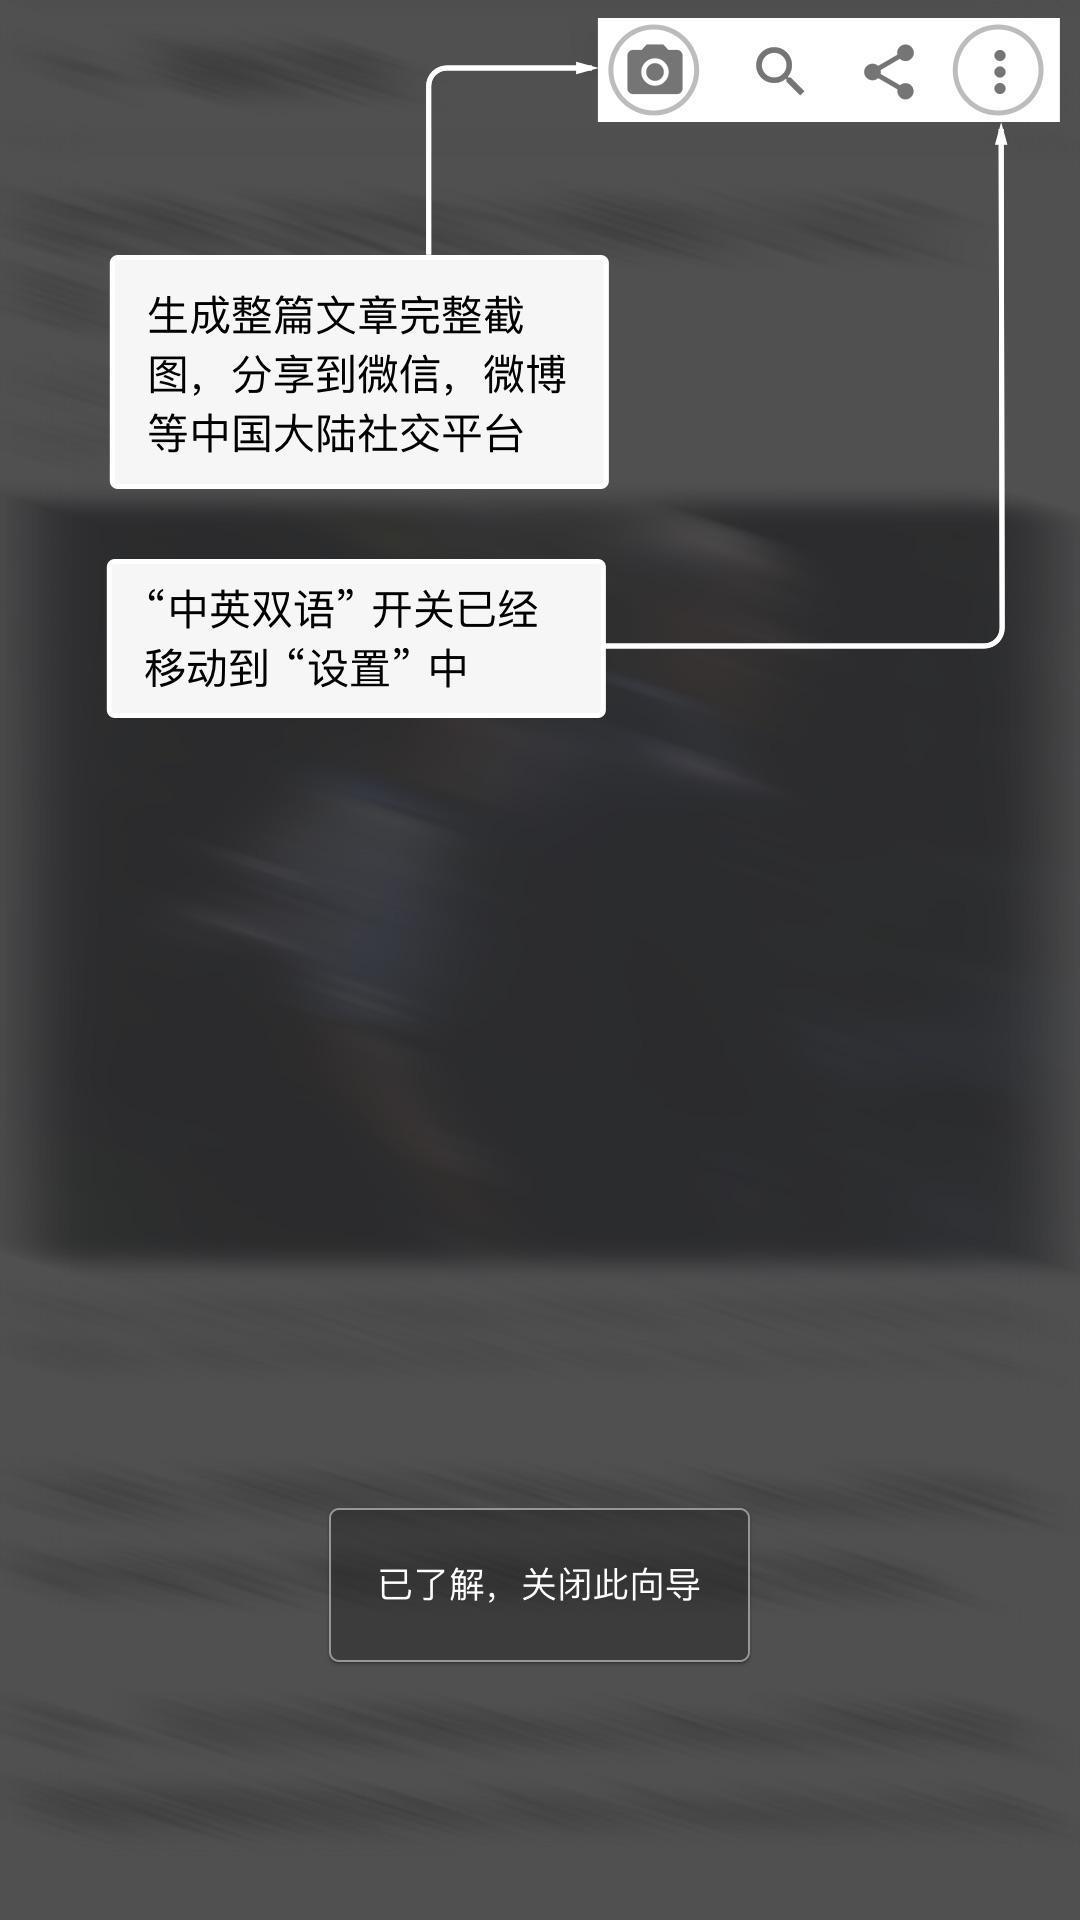 NYTimes - Chinese Edition 1.1.0.29 Screenshot 3